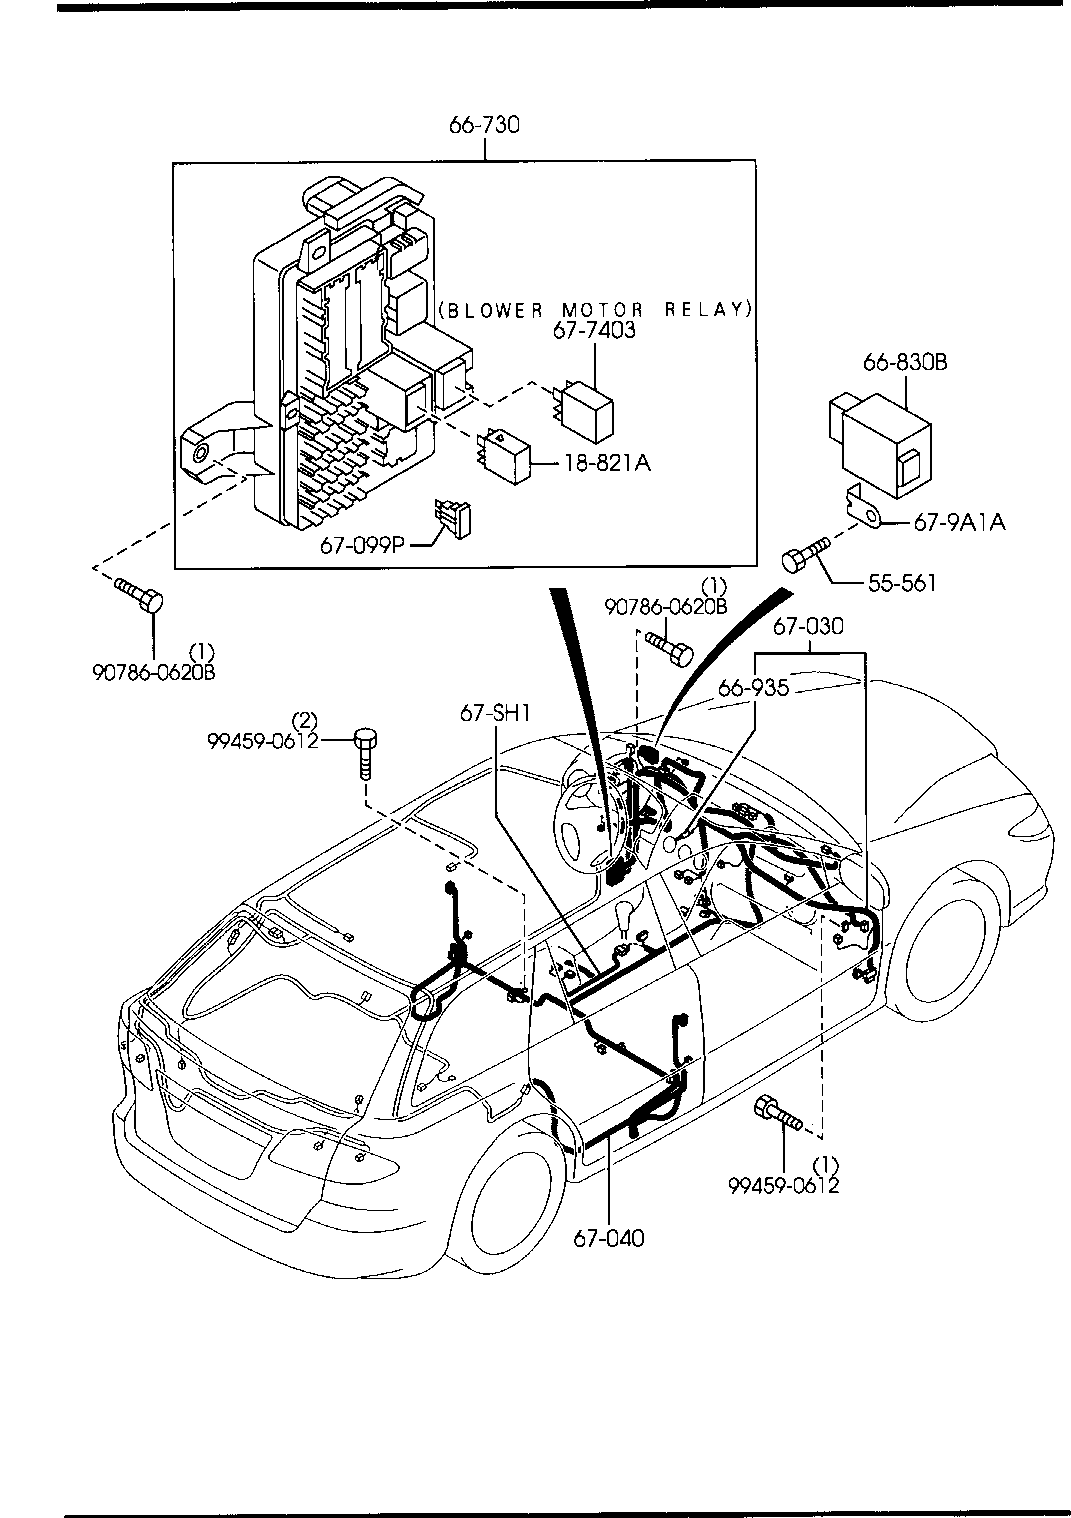 2005 Mazda 6 Wiring Harness